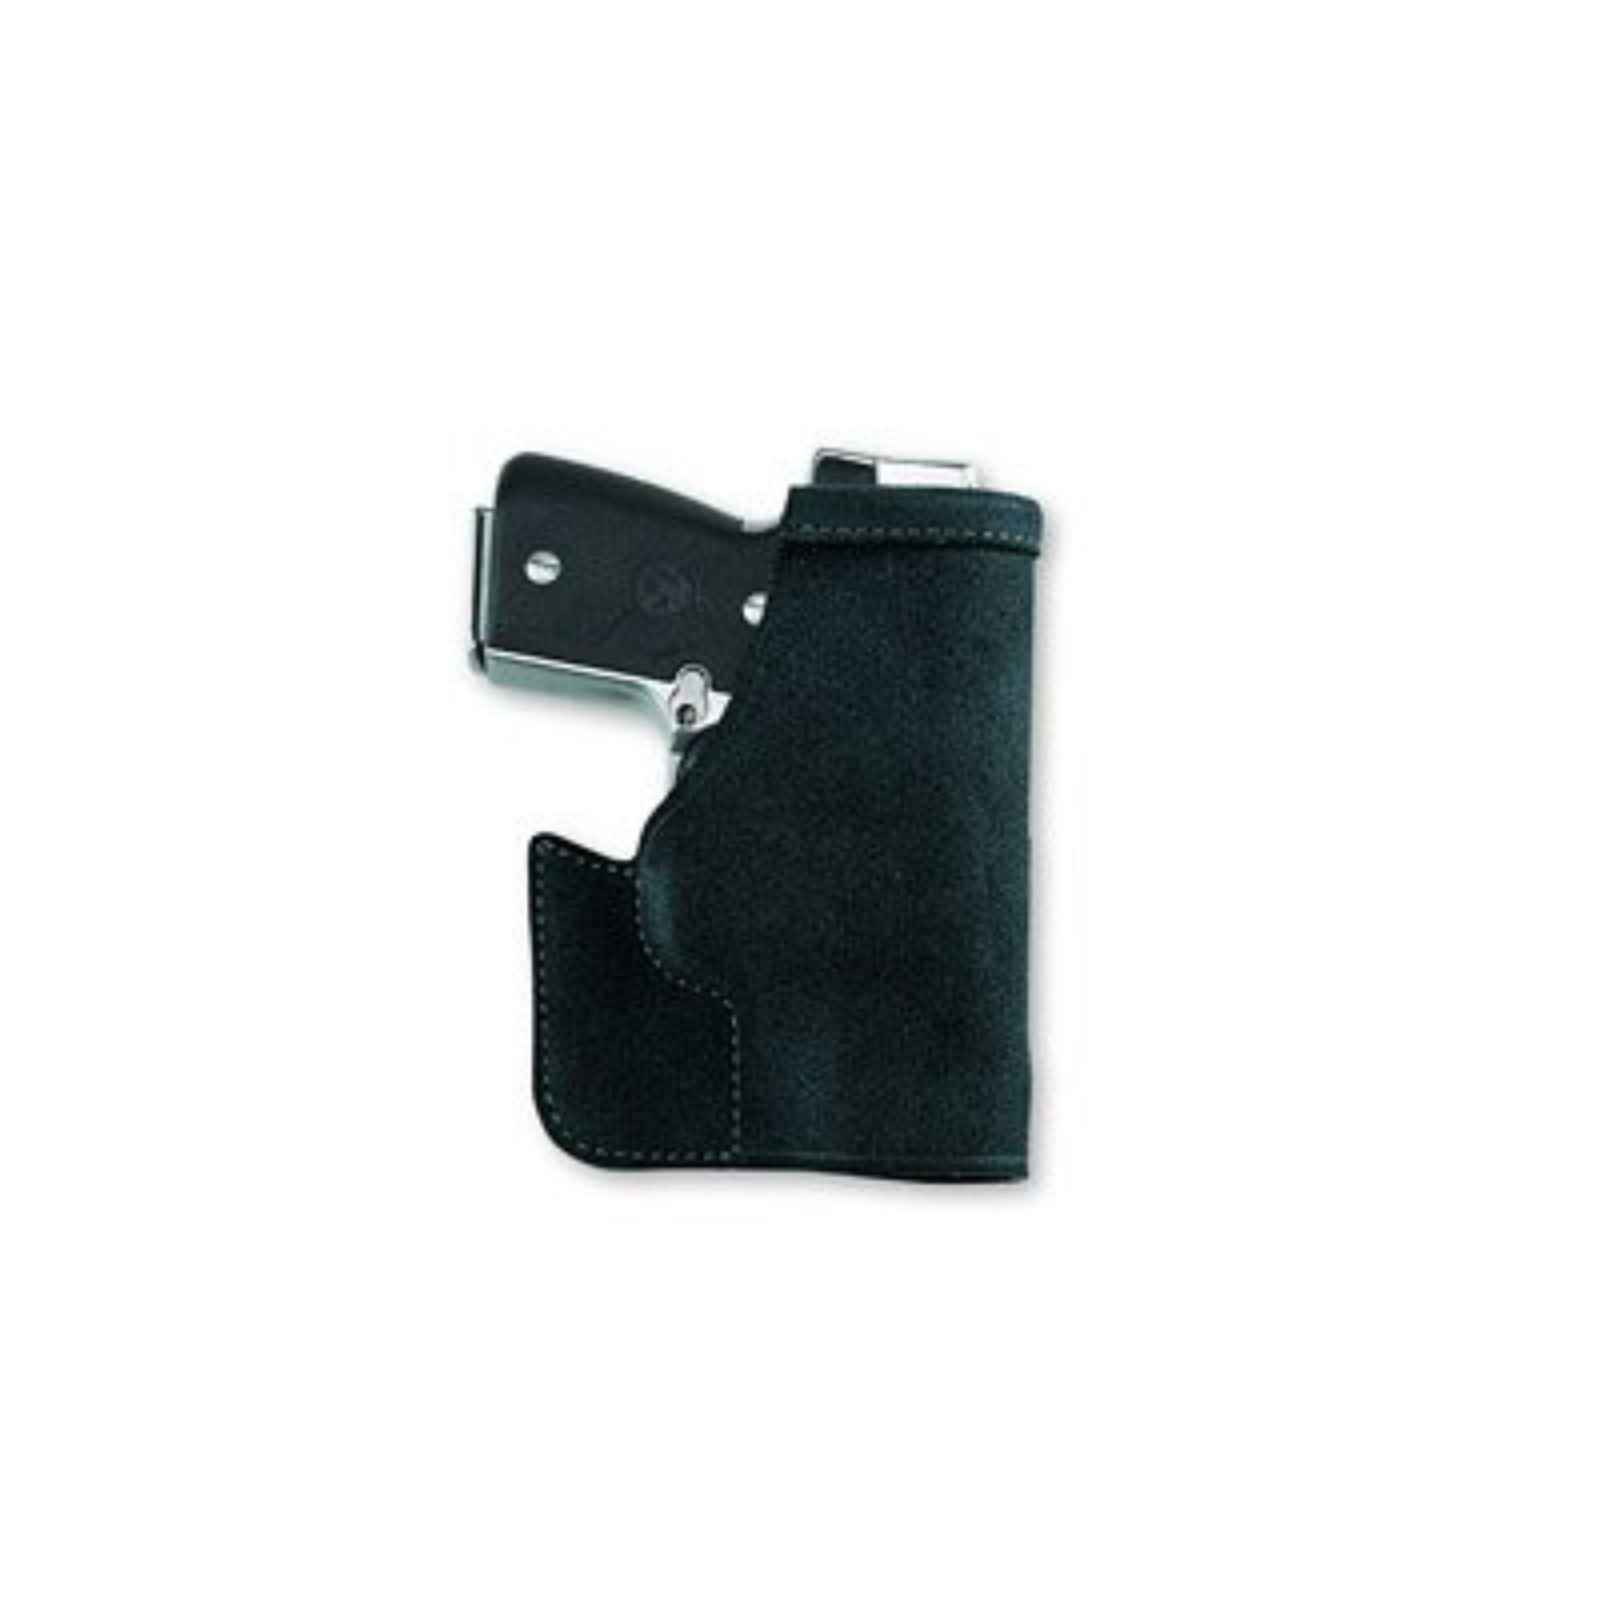 Galco PRO626B Pocket Pro SW BODYGUARD by GALCO INTERNATIONAL